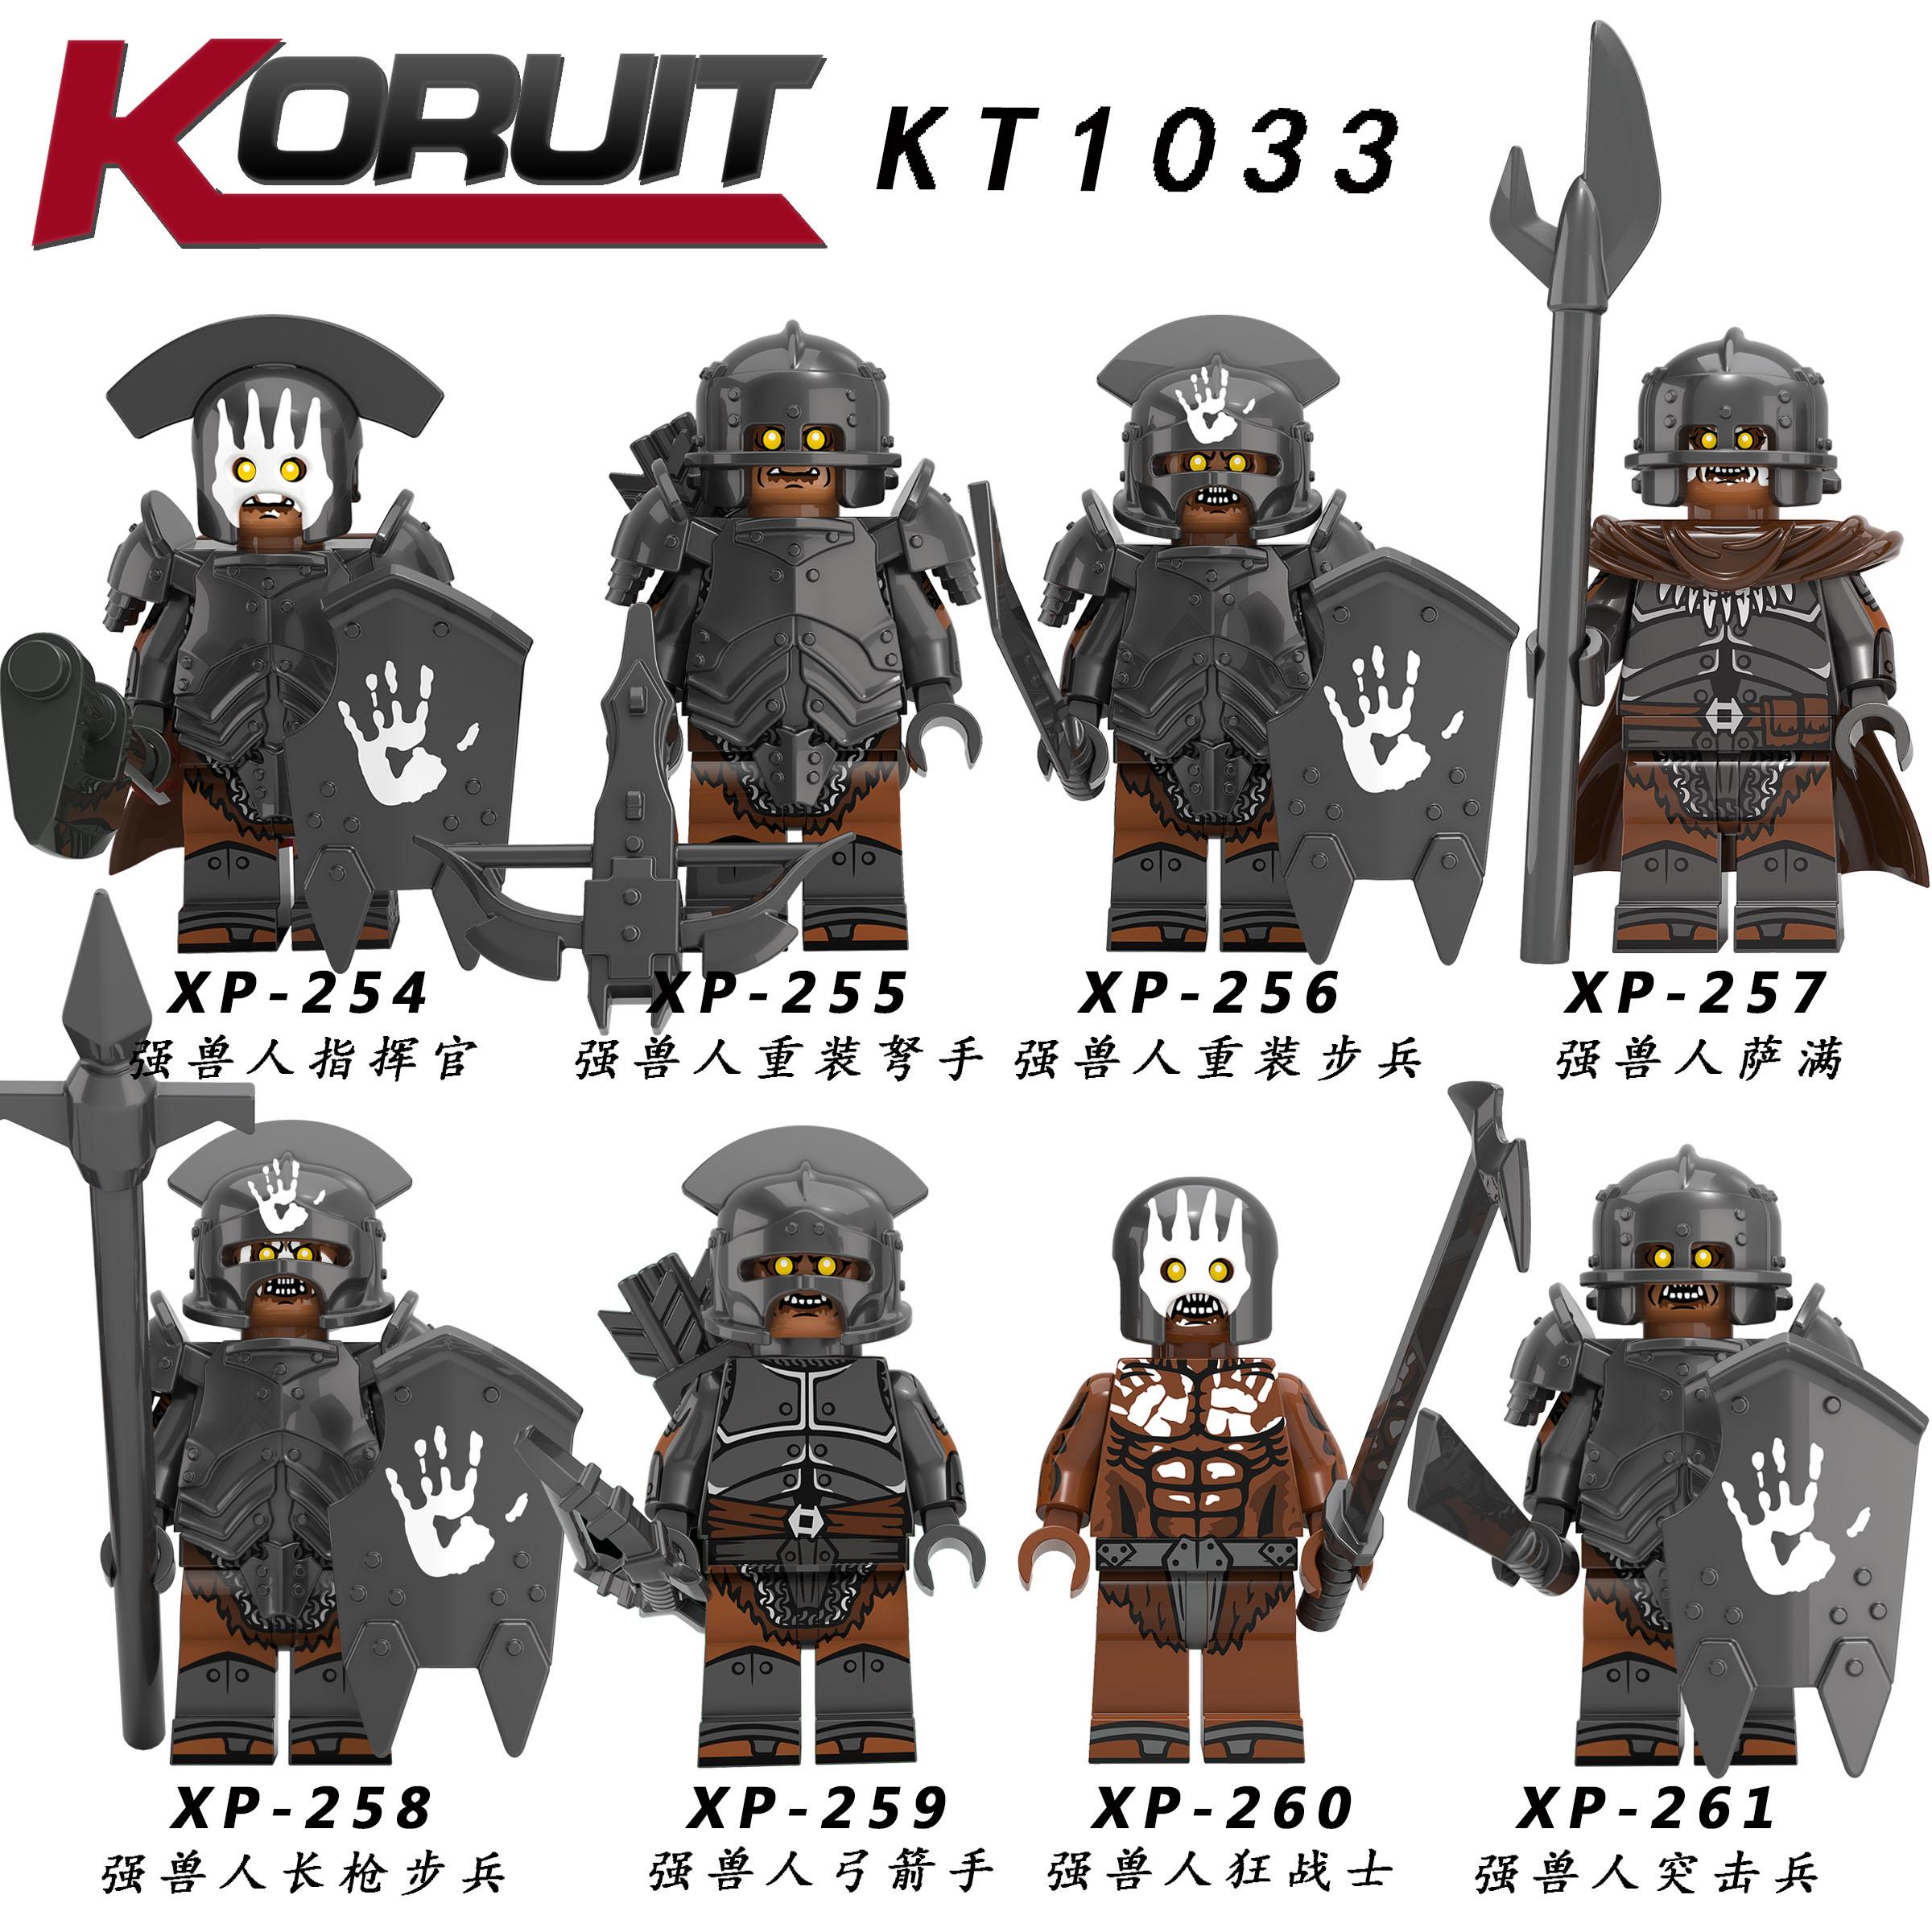 Single Sale Uruk Hai Commander Figure Archer Army Armor Weapon Rider Rifleman Berserker Building Blocks Bricks Set Toys